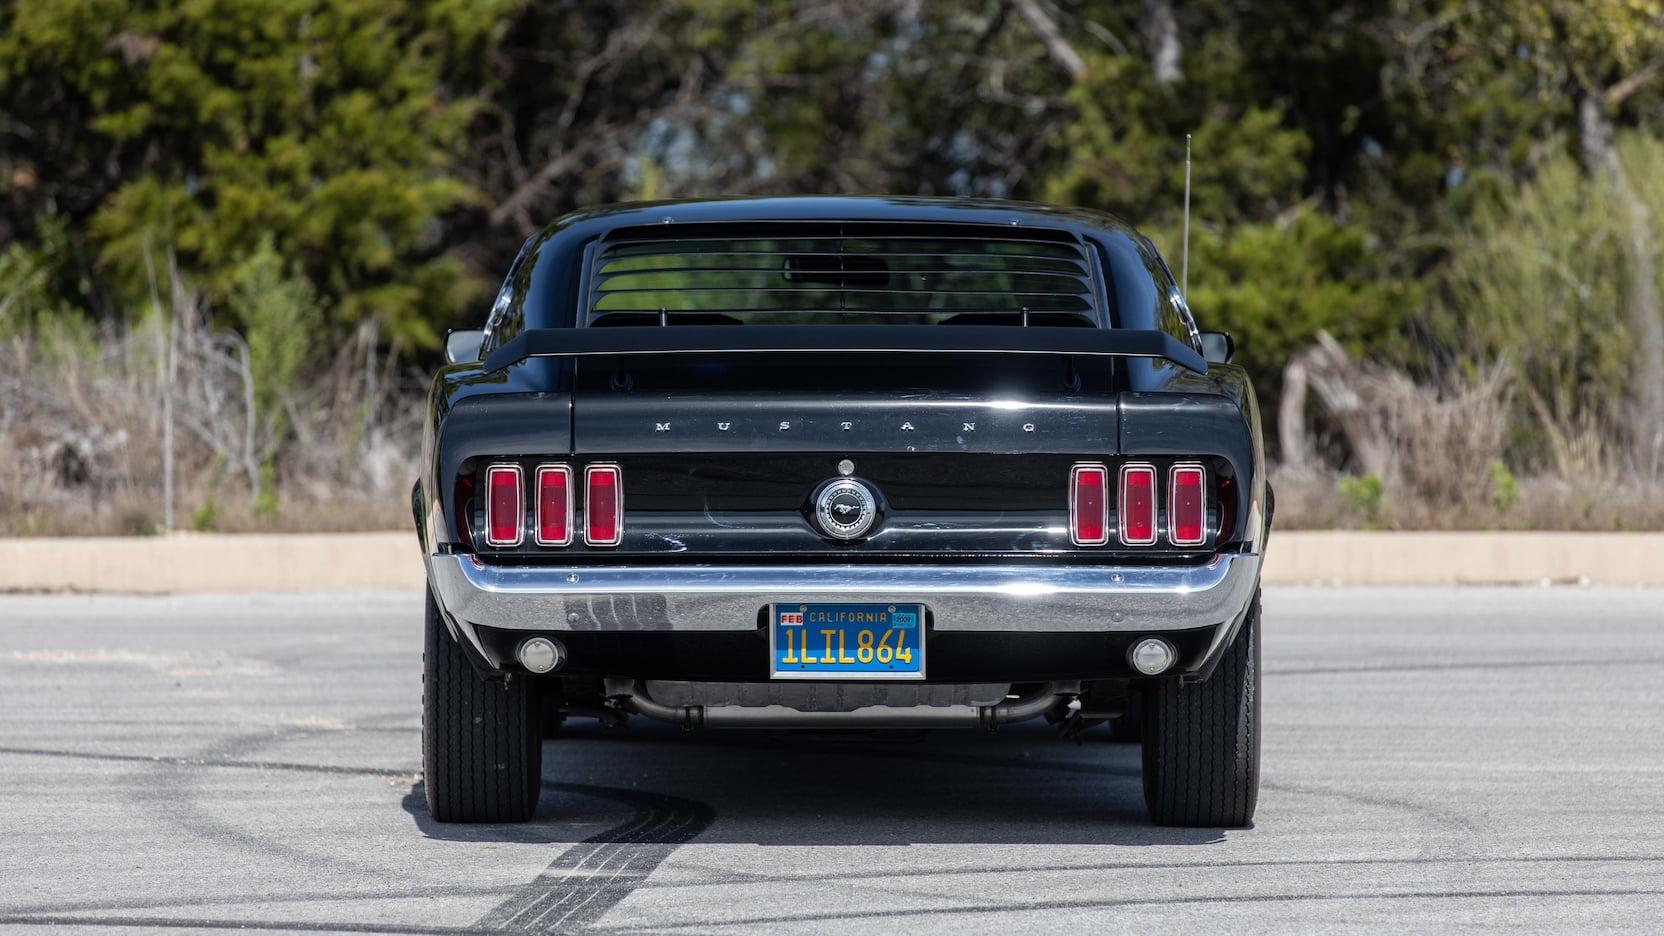 1969 Ford Mustang Boss 429 Fastback Rear